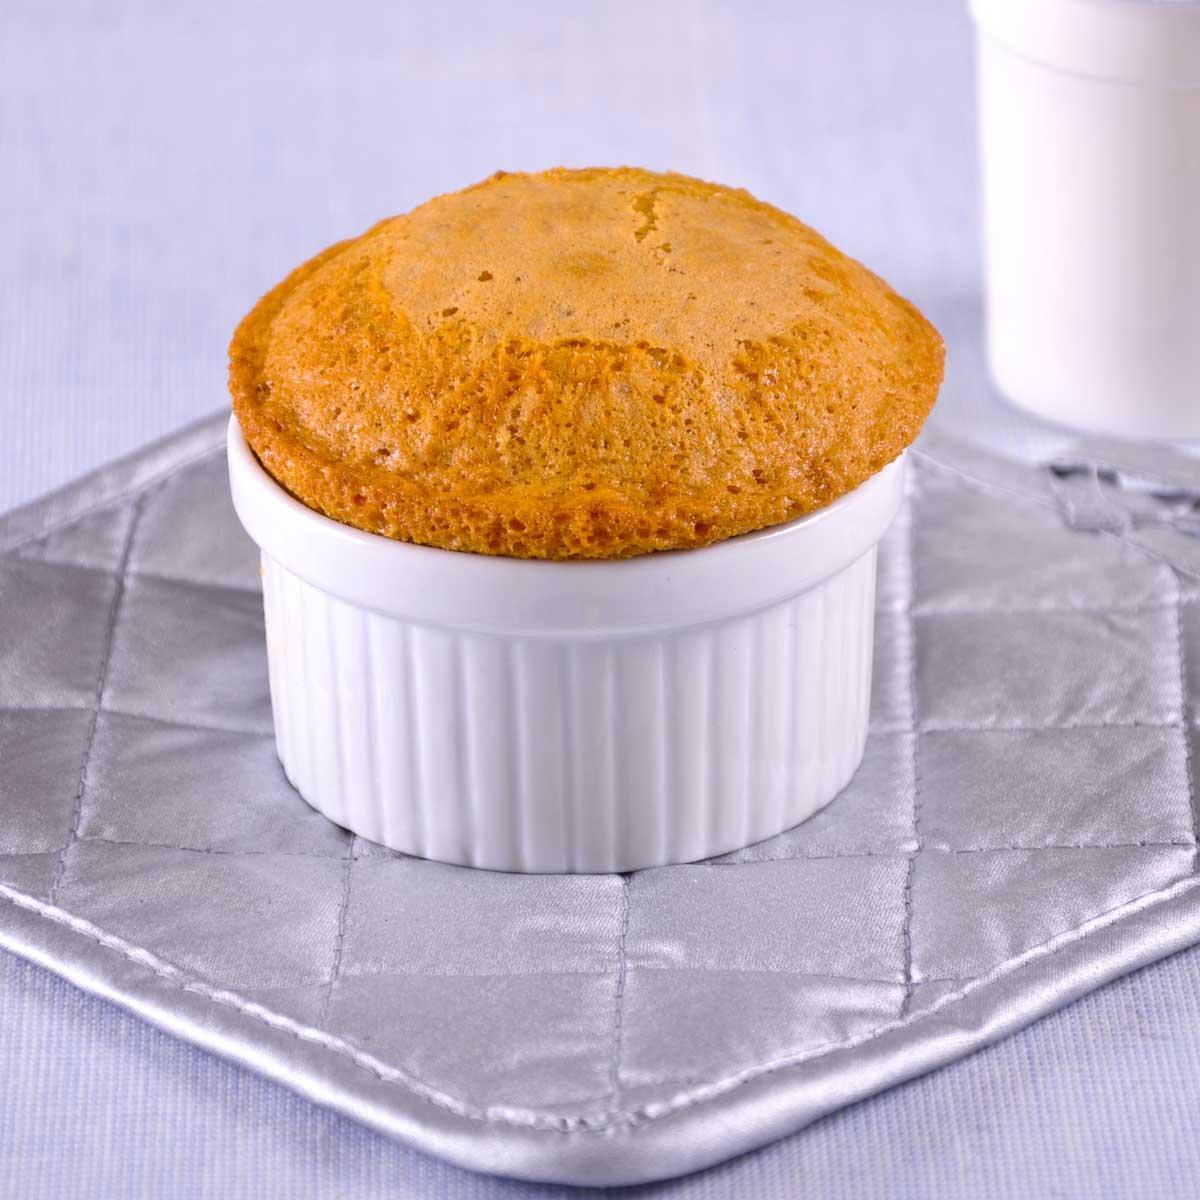 recette g teau au yaourt sans gluten ni uf ni lait cuisine madame figaro. Black Bedroom Furniture Sets. Home Design Ideas